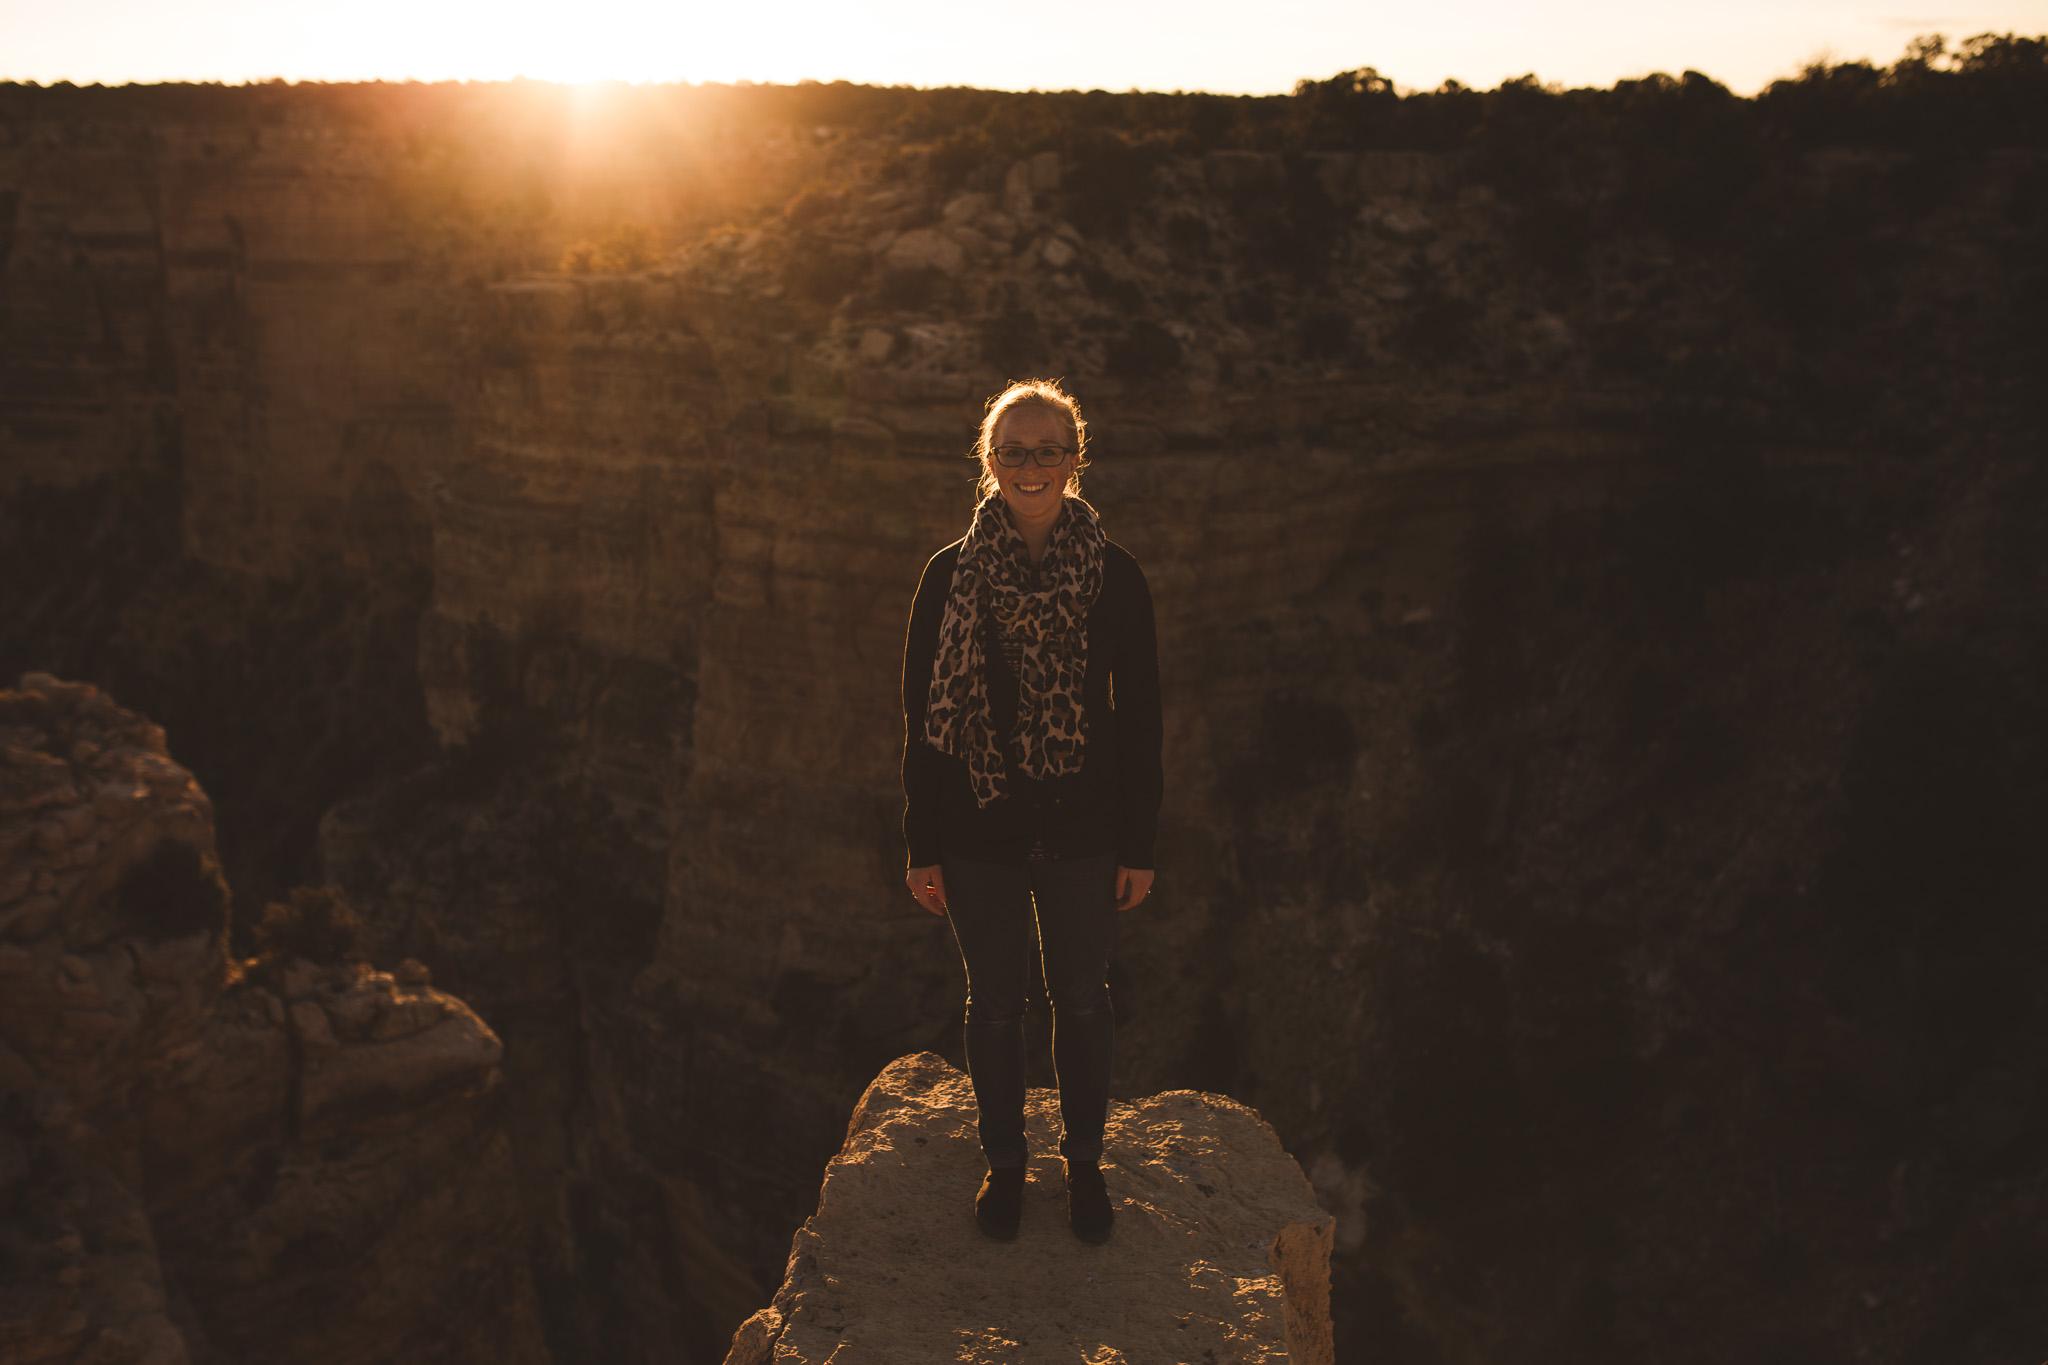 backit-grand-canyon-portrait